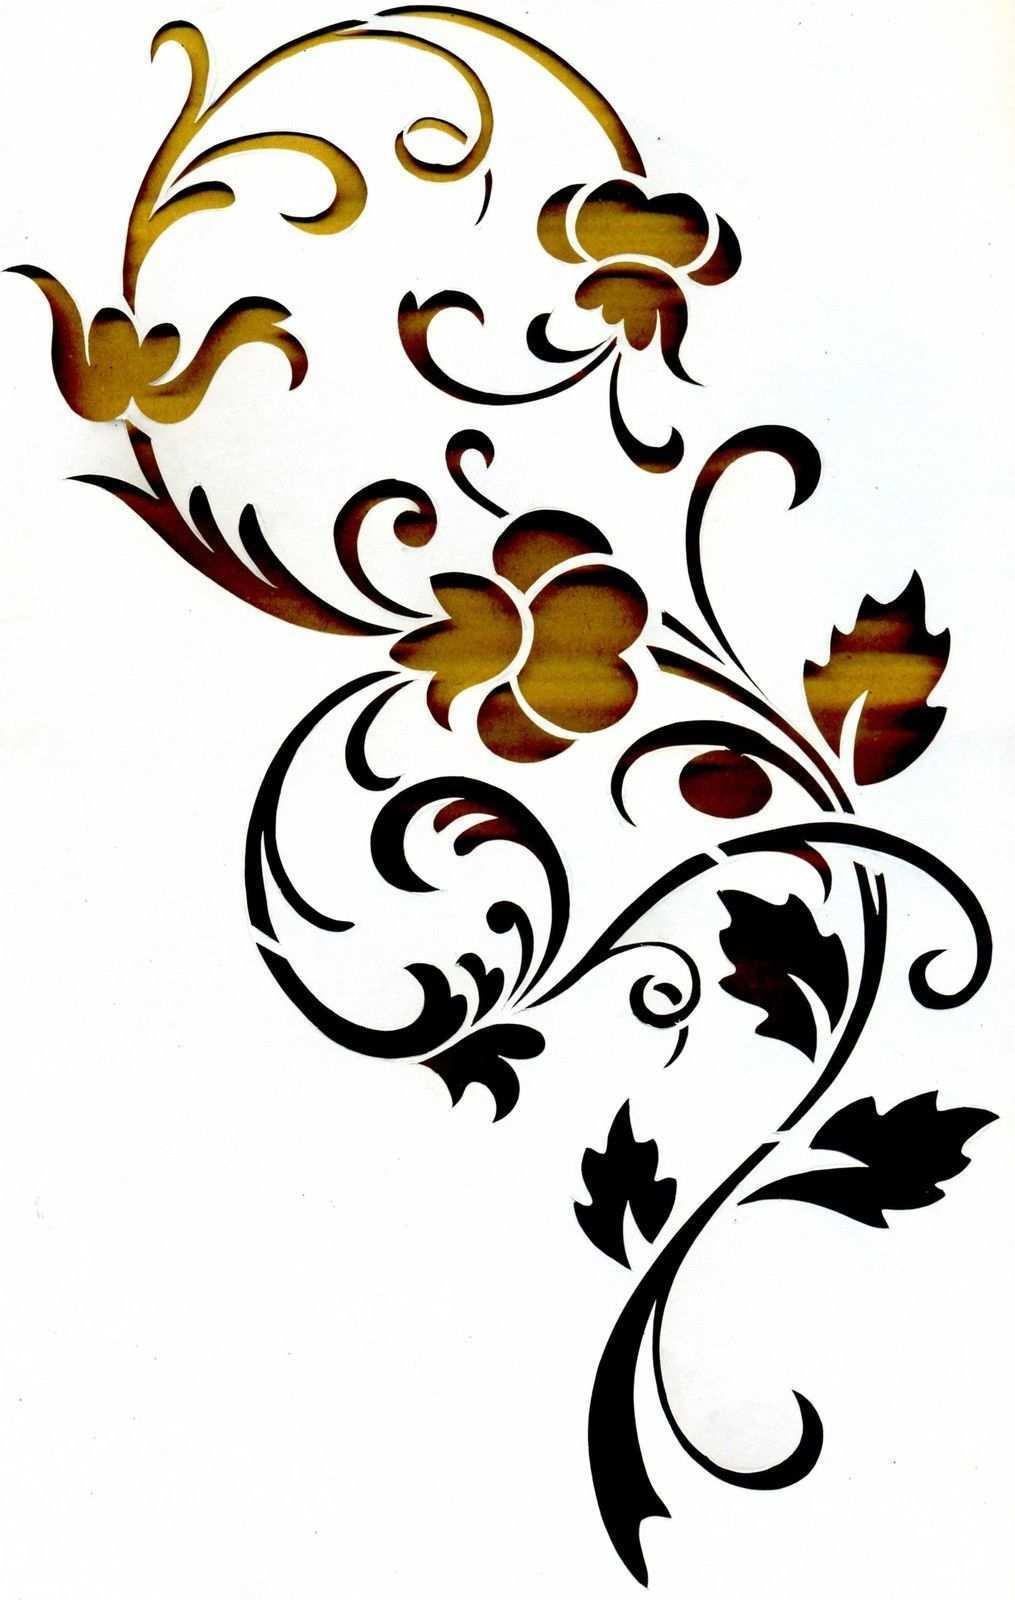 Wandschablonen Schablone Wandtattoo Ornament Stencil Painting Stencil Art Fabric Painting